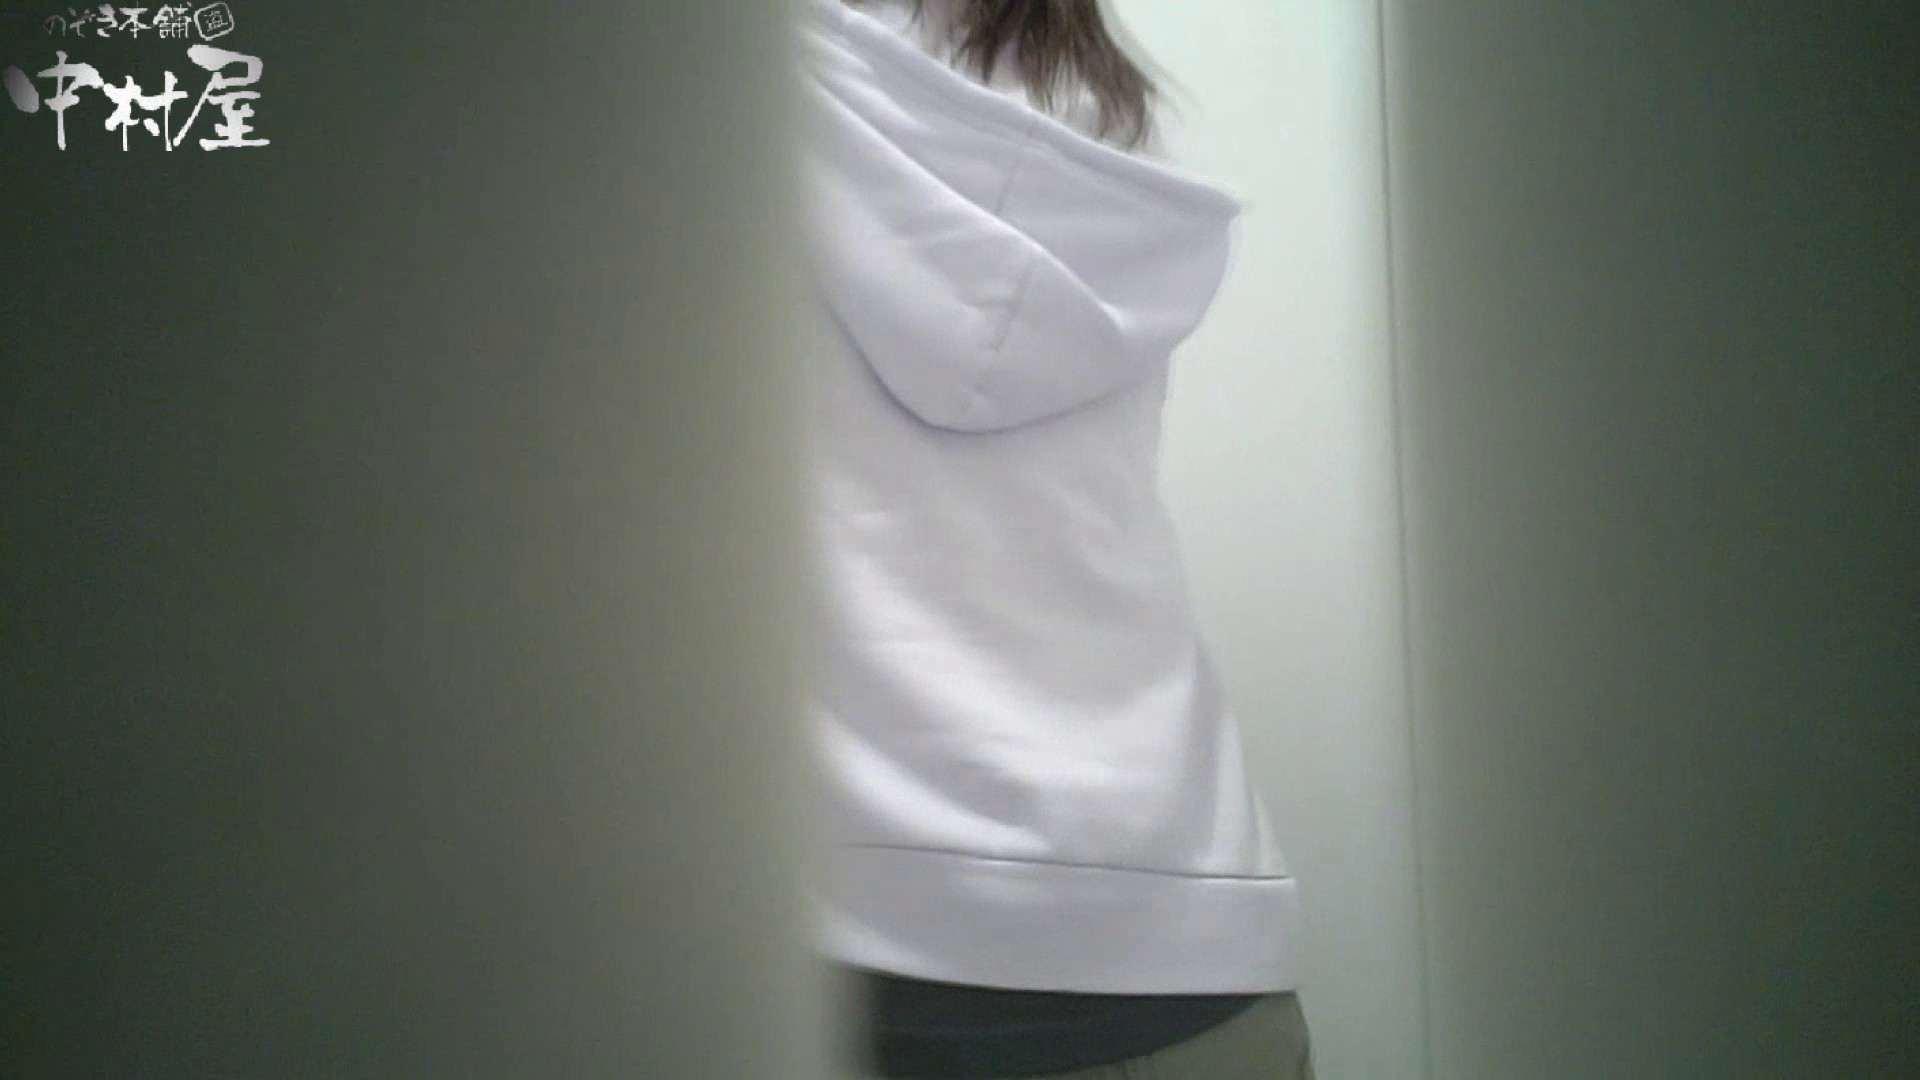 【某有名大学女性洗面所】有名大学女性洗面所 vol.35 安定の2カメ 最近の女性は保守的な下着が多め? 下着   潜入画像  83画像 47